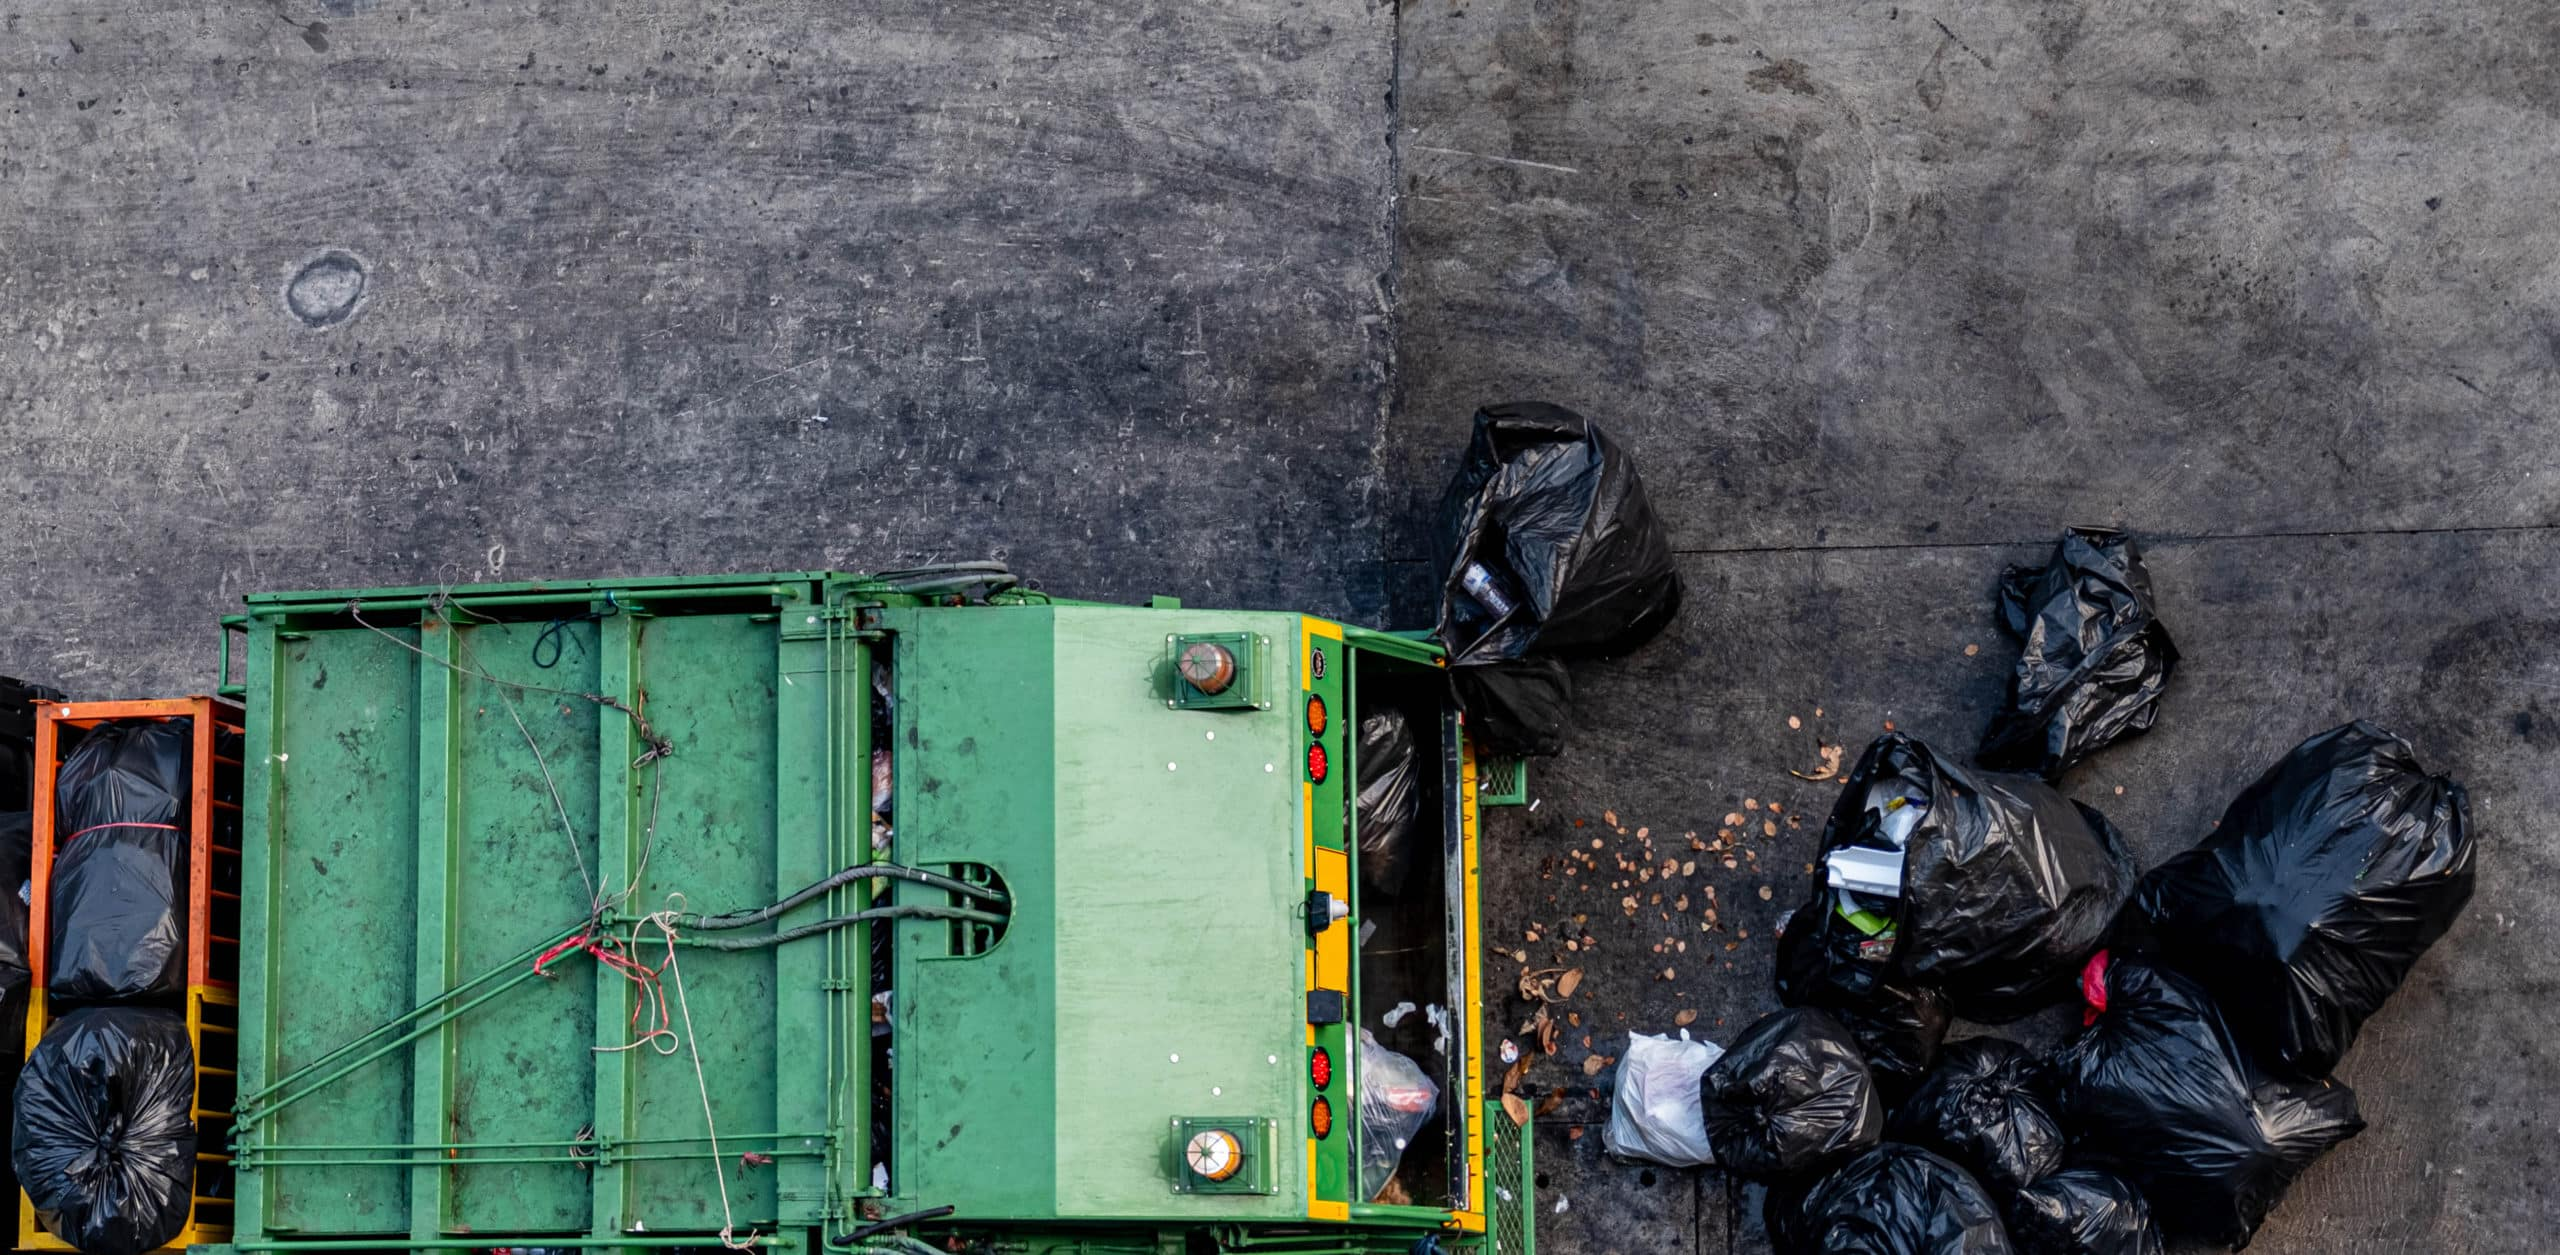 green-garbage-truck-collecting-large-number-black-garbage-bags